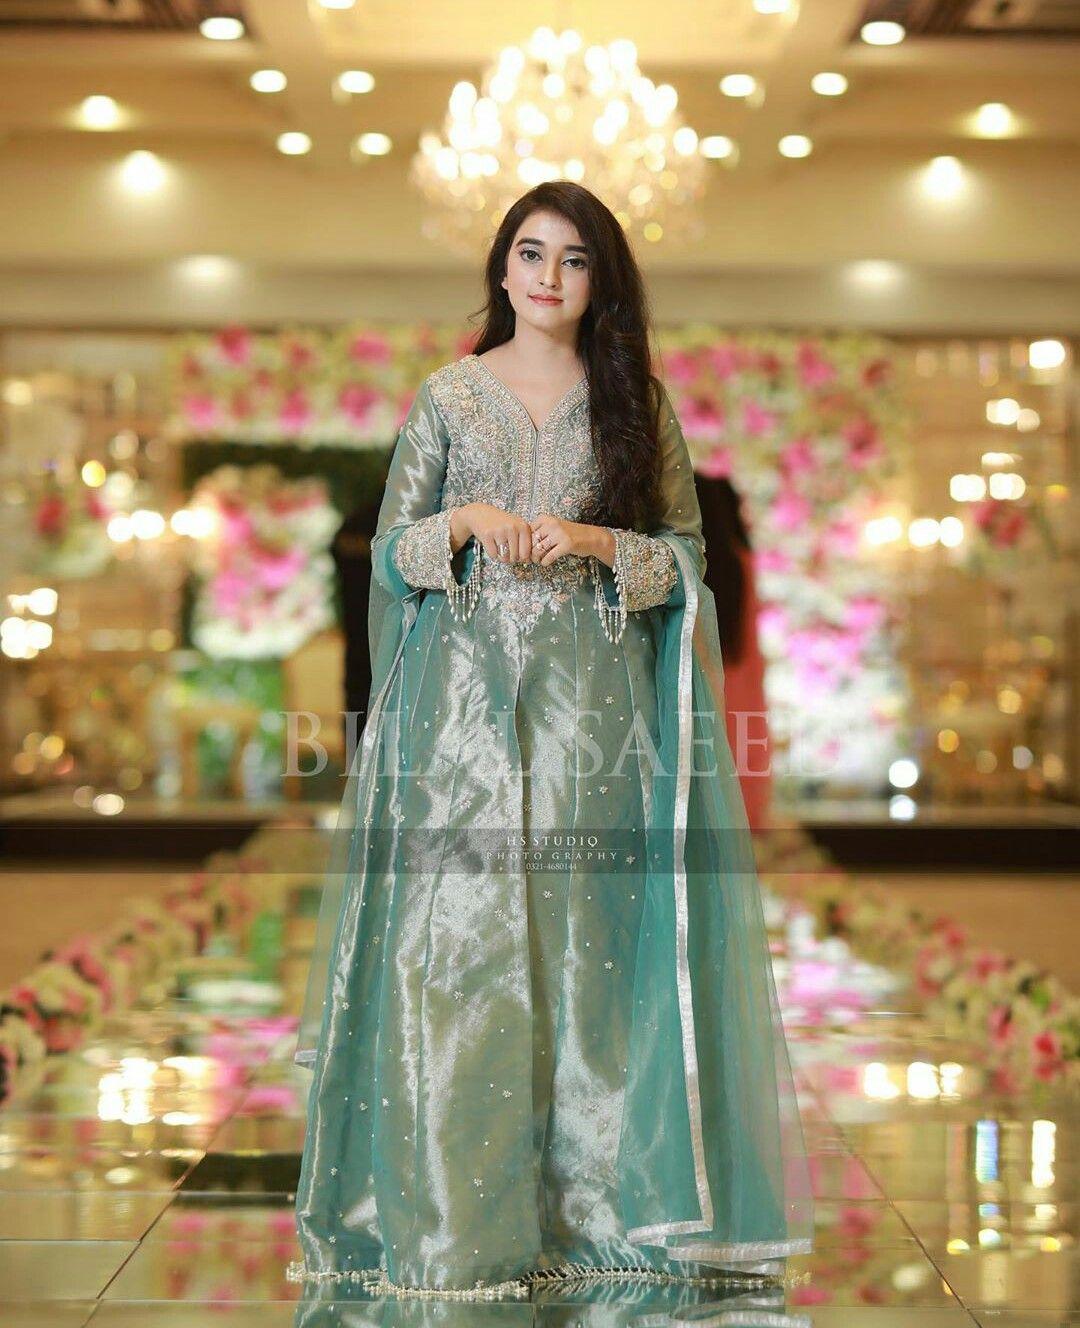 Bride sister's wedding vibes   Stylish dresses for girls, Wedding ...